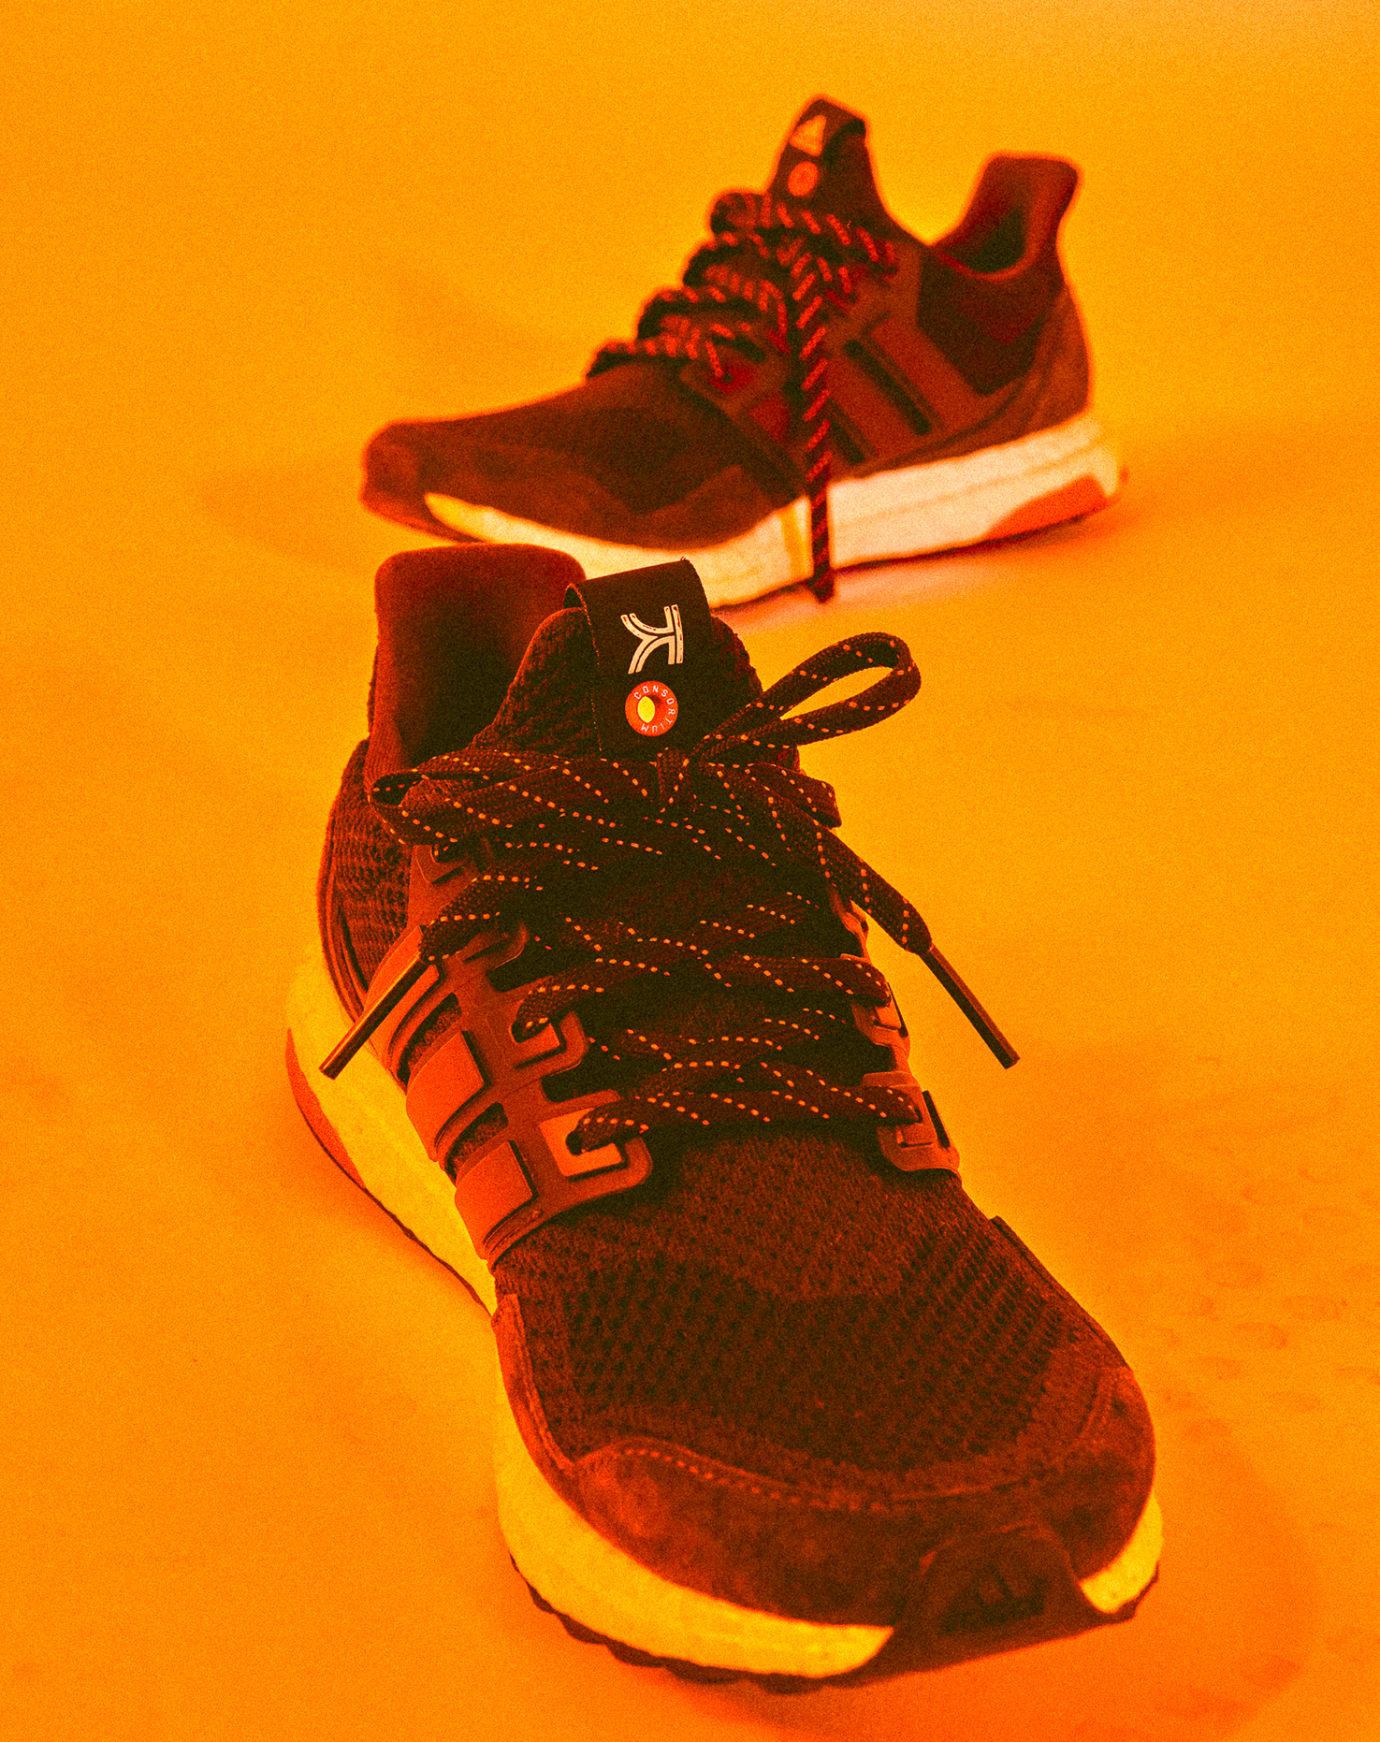 finest selection 26354 22264 Kinfolk x Adidas Consortium Ultra Boost BB9520 Release Date